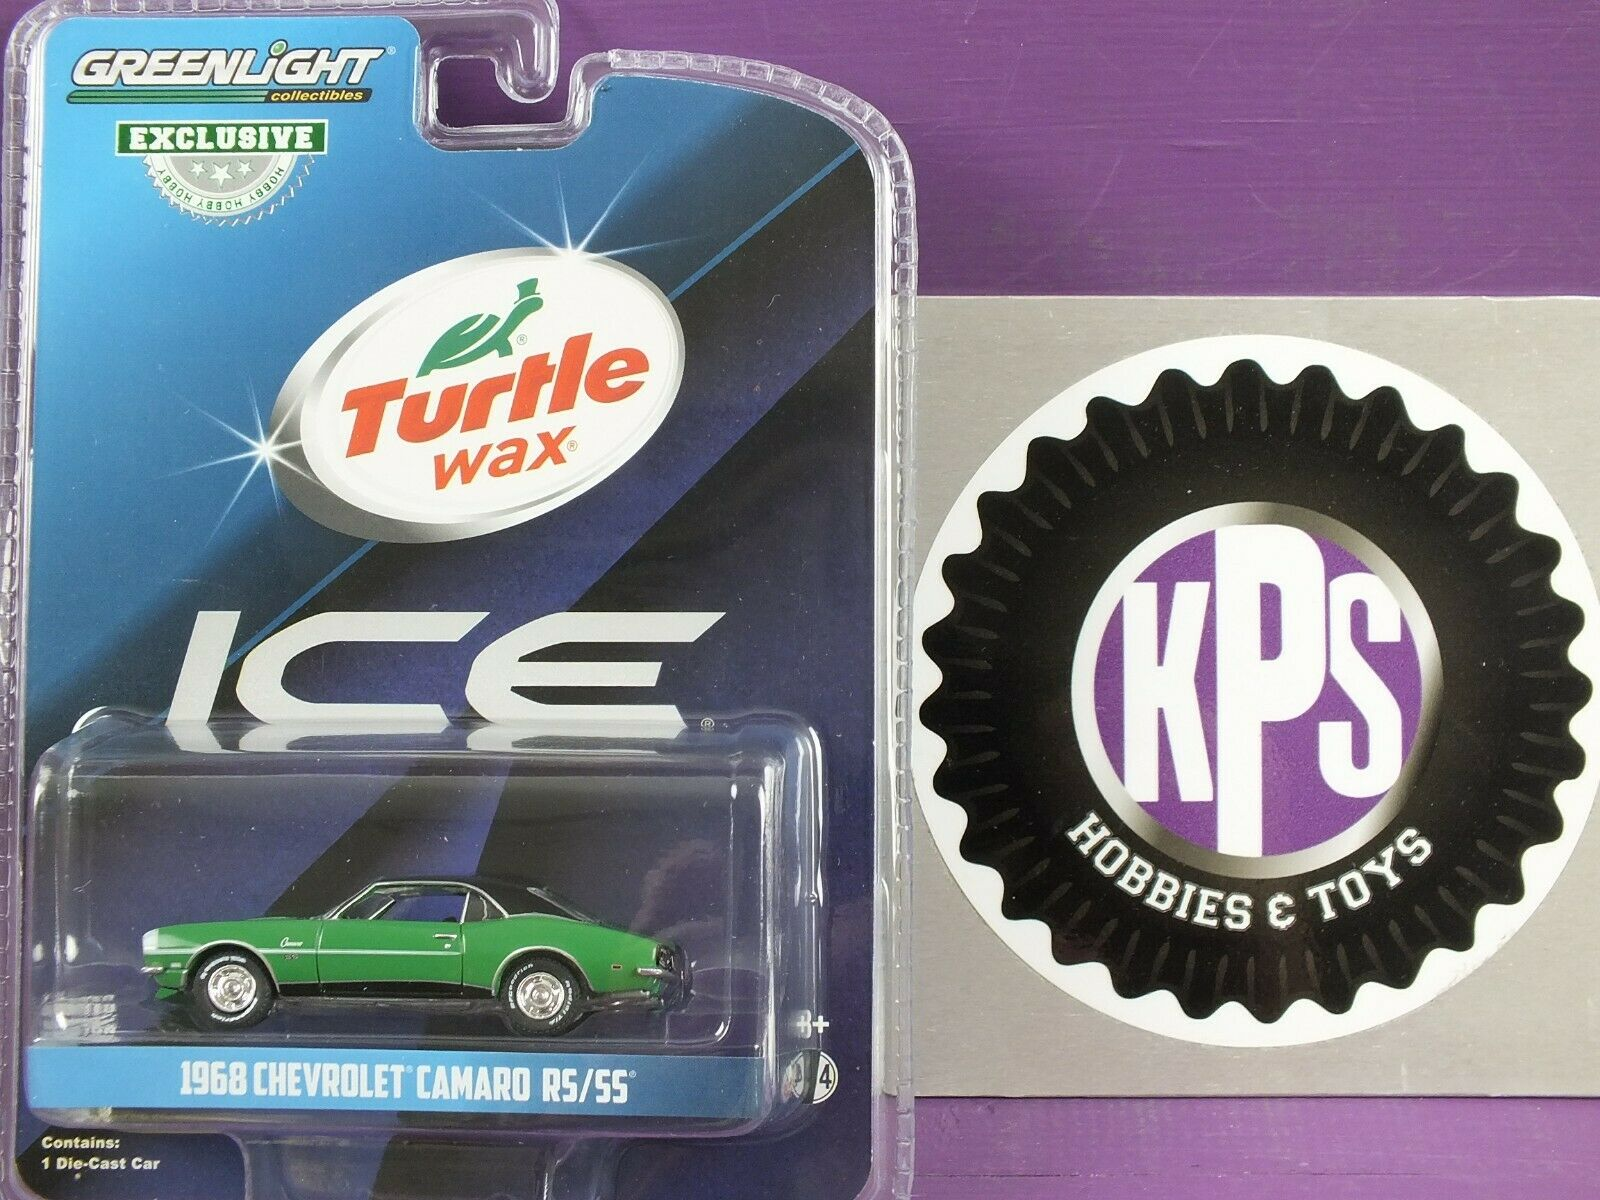 Turtle Wax - 1968 Chevrolet Camaro RS/SS - Turtle Wax Ice, G